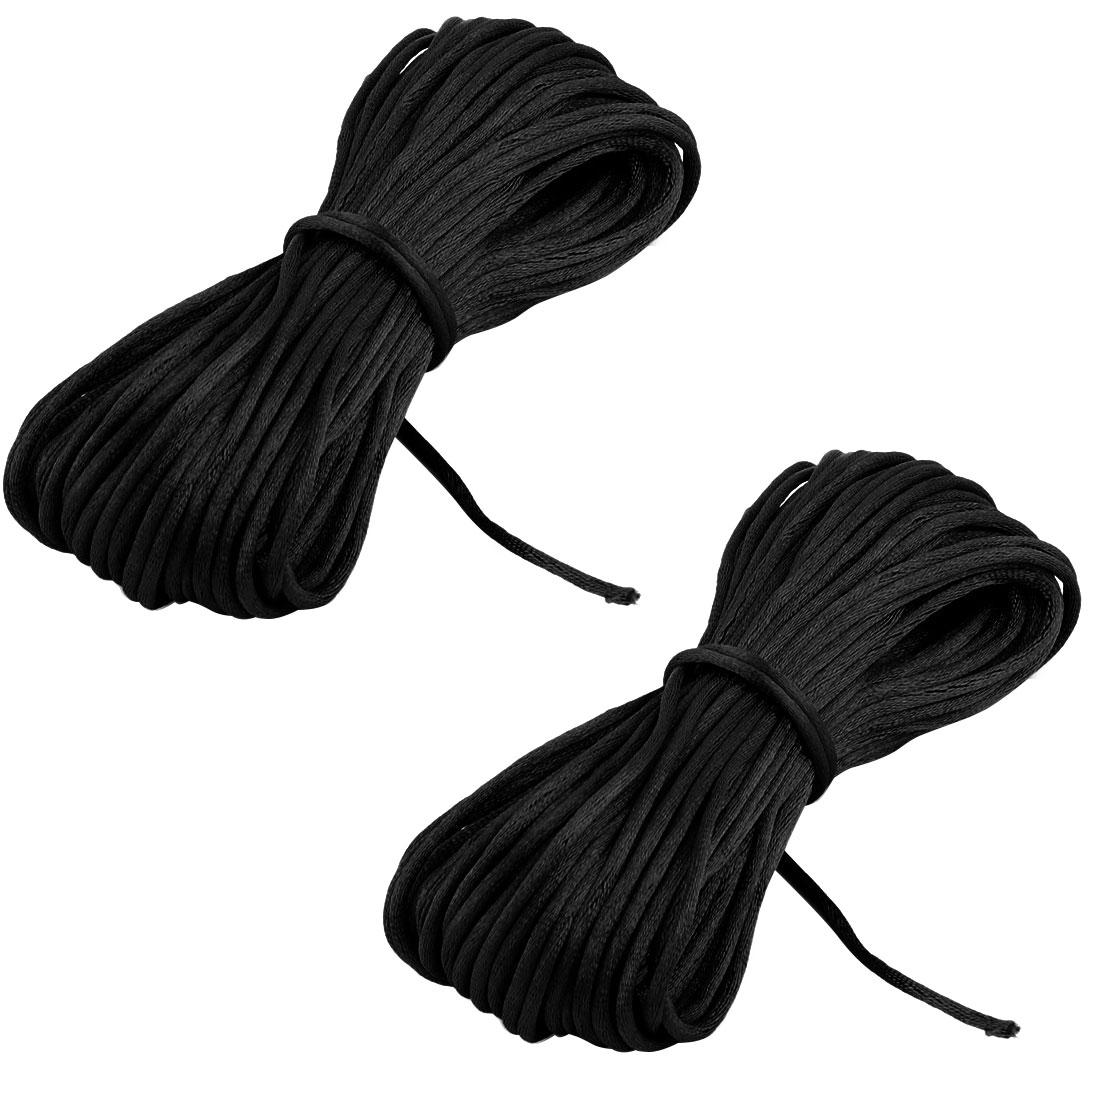 Festival Nylon DIY Handcraft Bracelet Chain Cord String Rope Black 22 Yards 2pcs